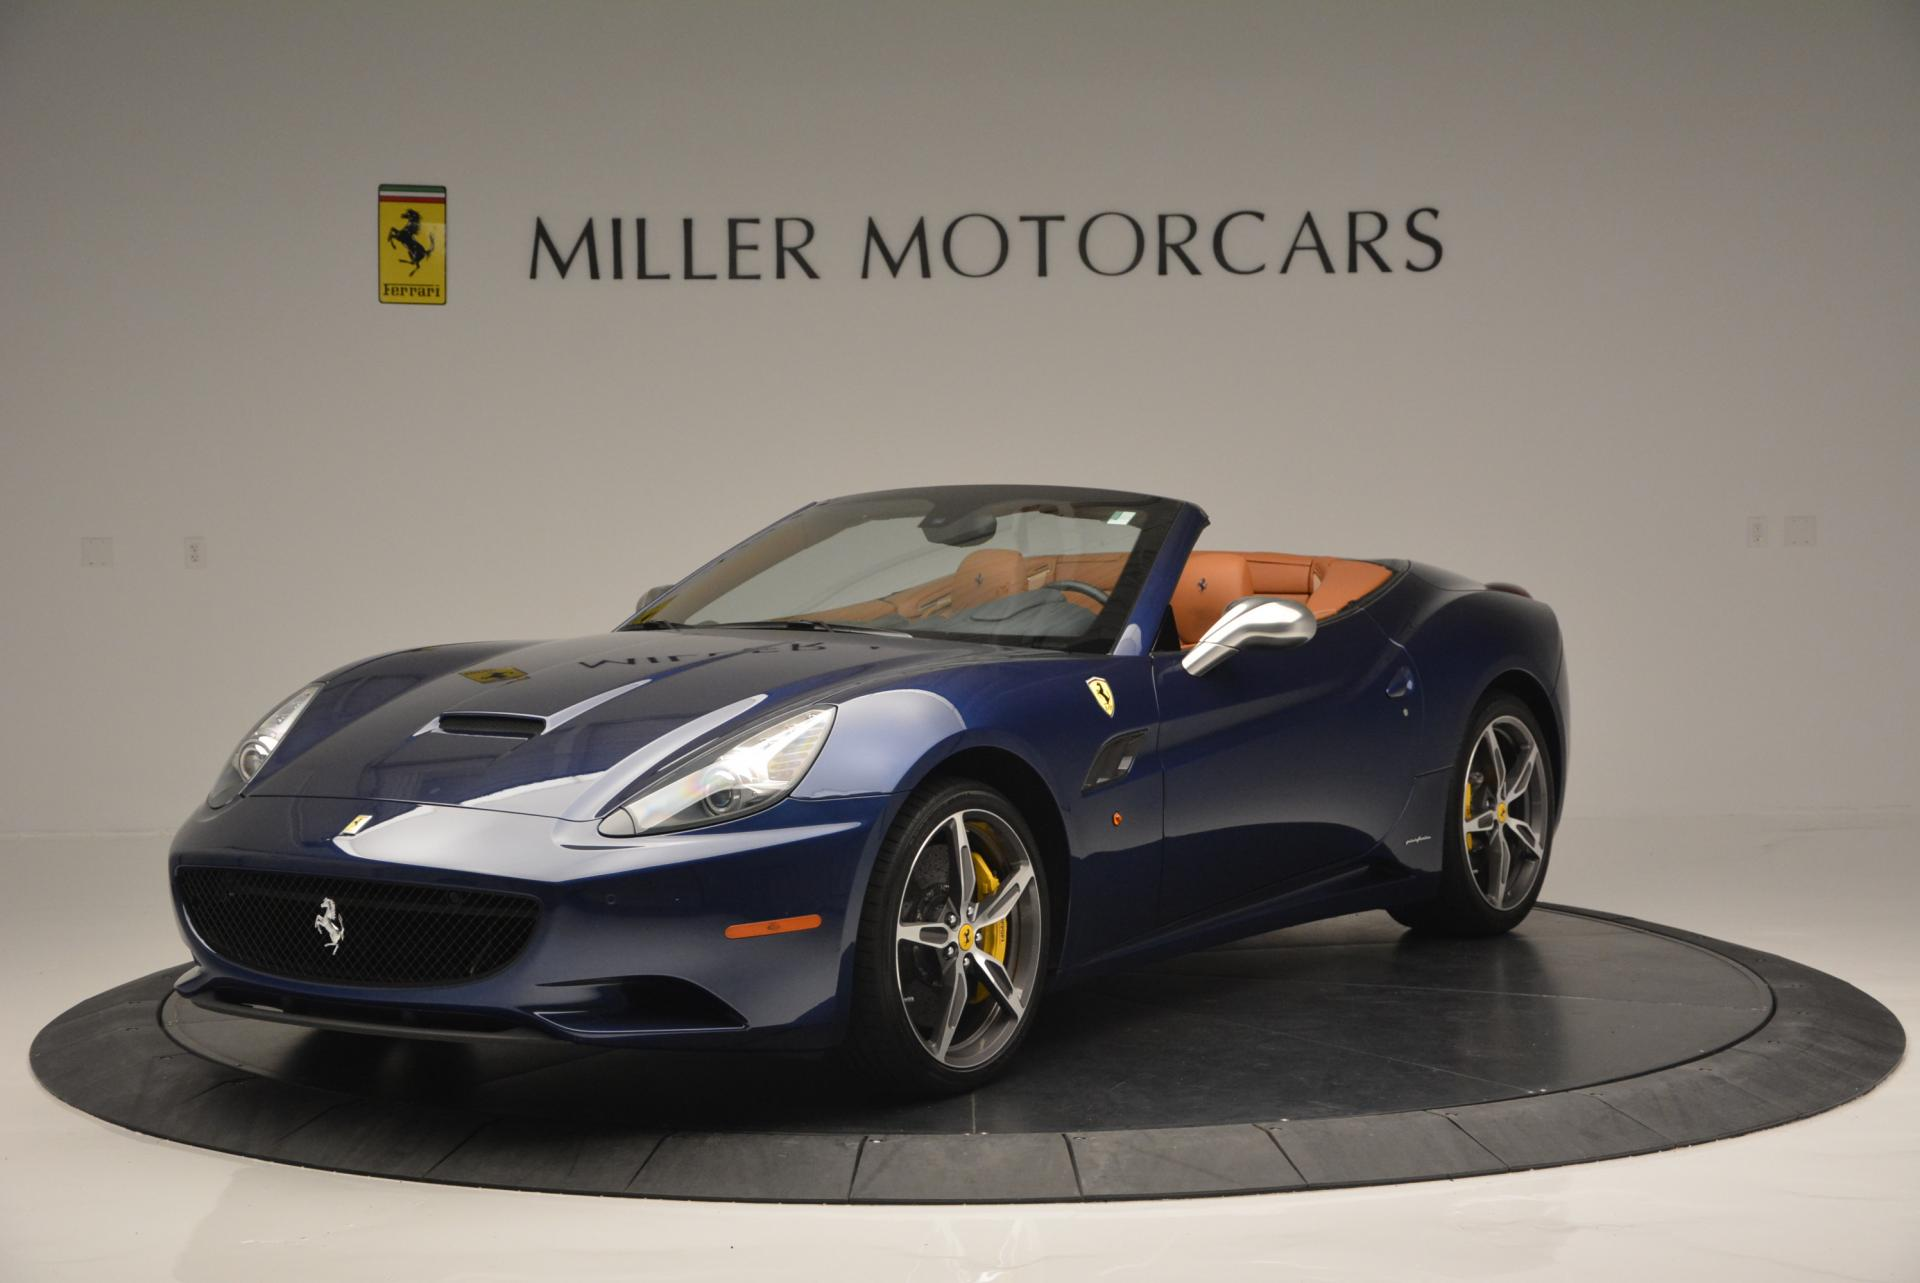 Used 2013 Ferrari California 30 for sale Sold at Pagani of Greenwich in Greenwich CT 06830 1